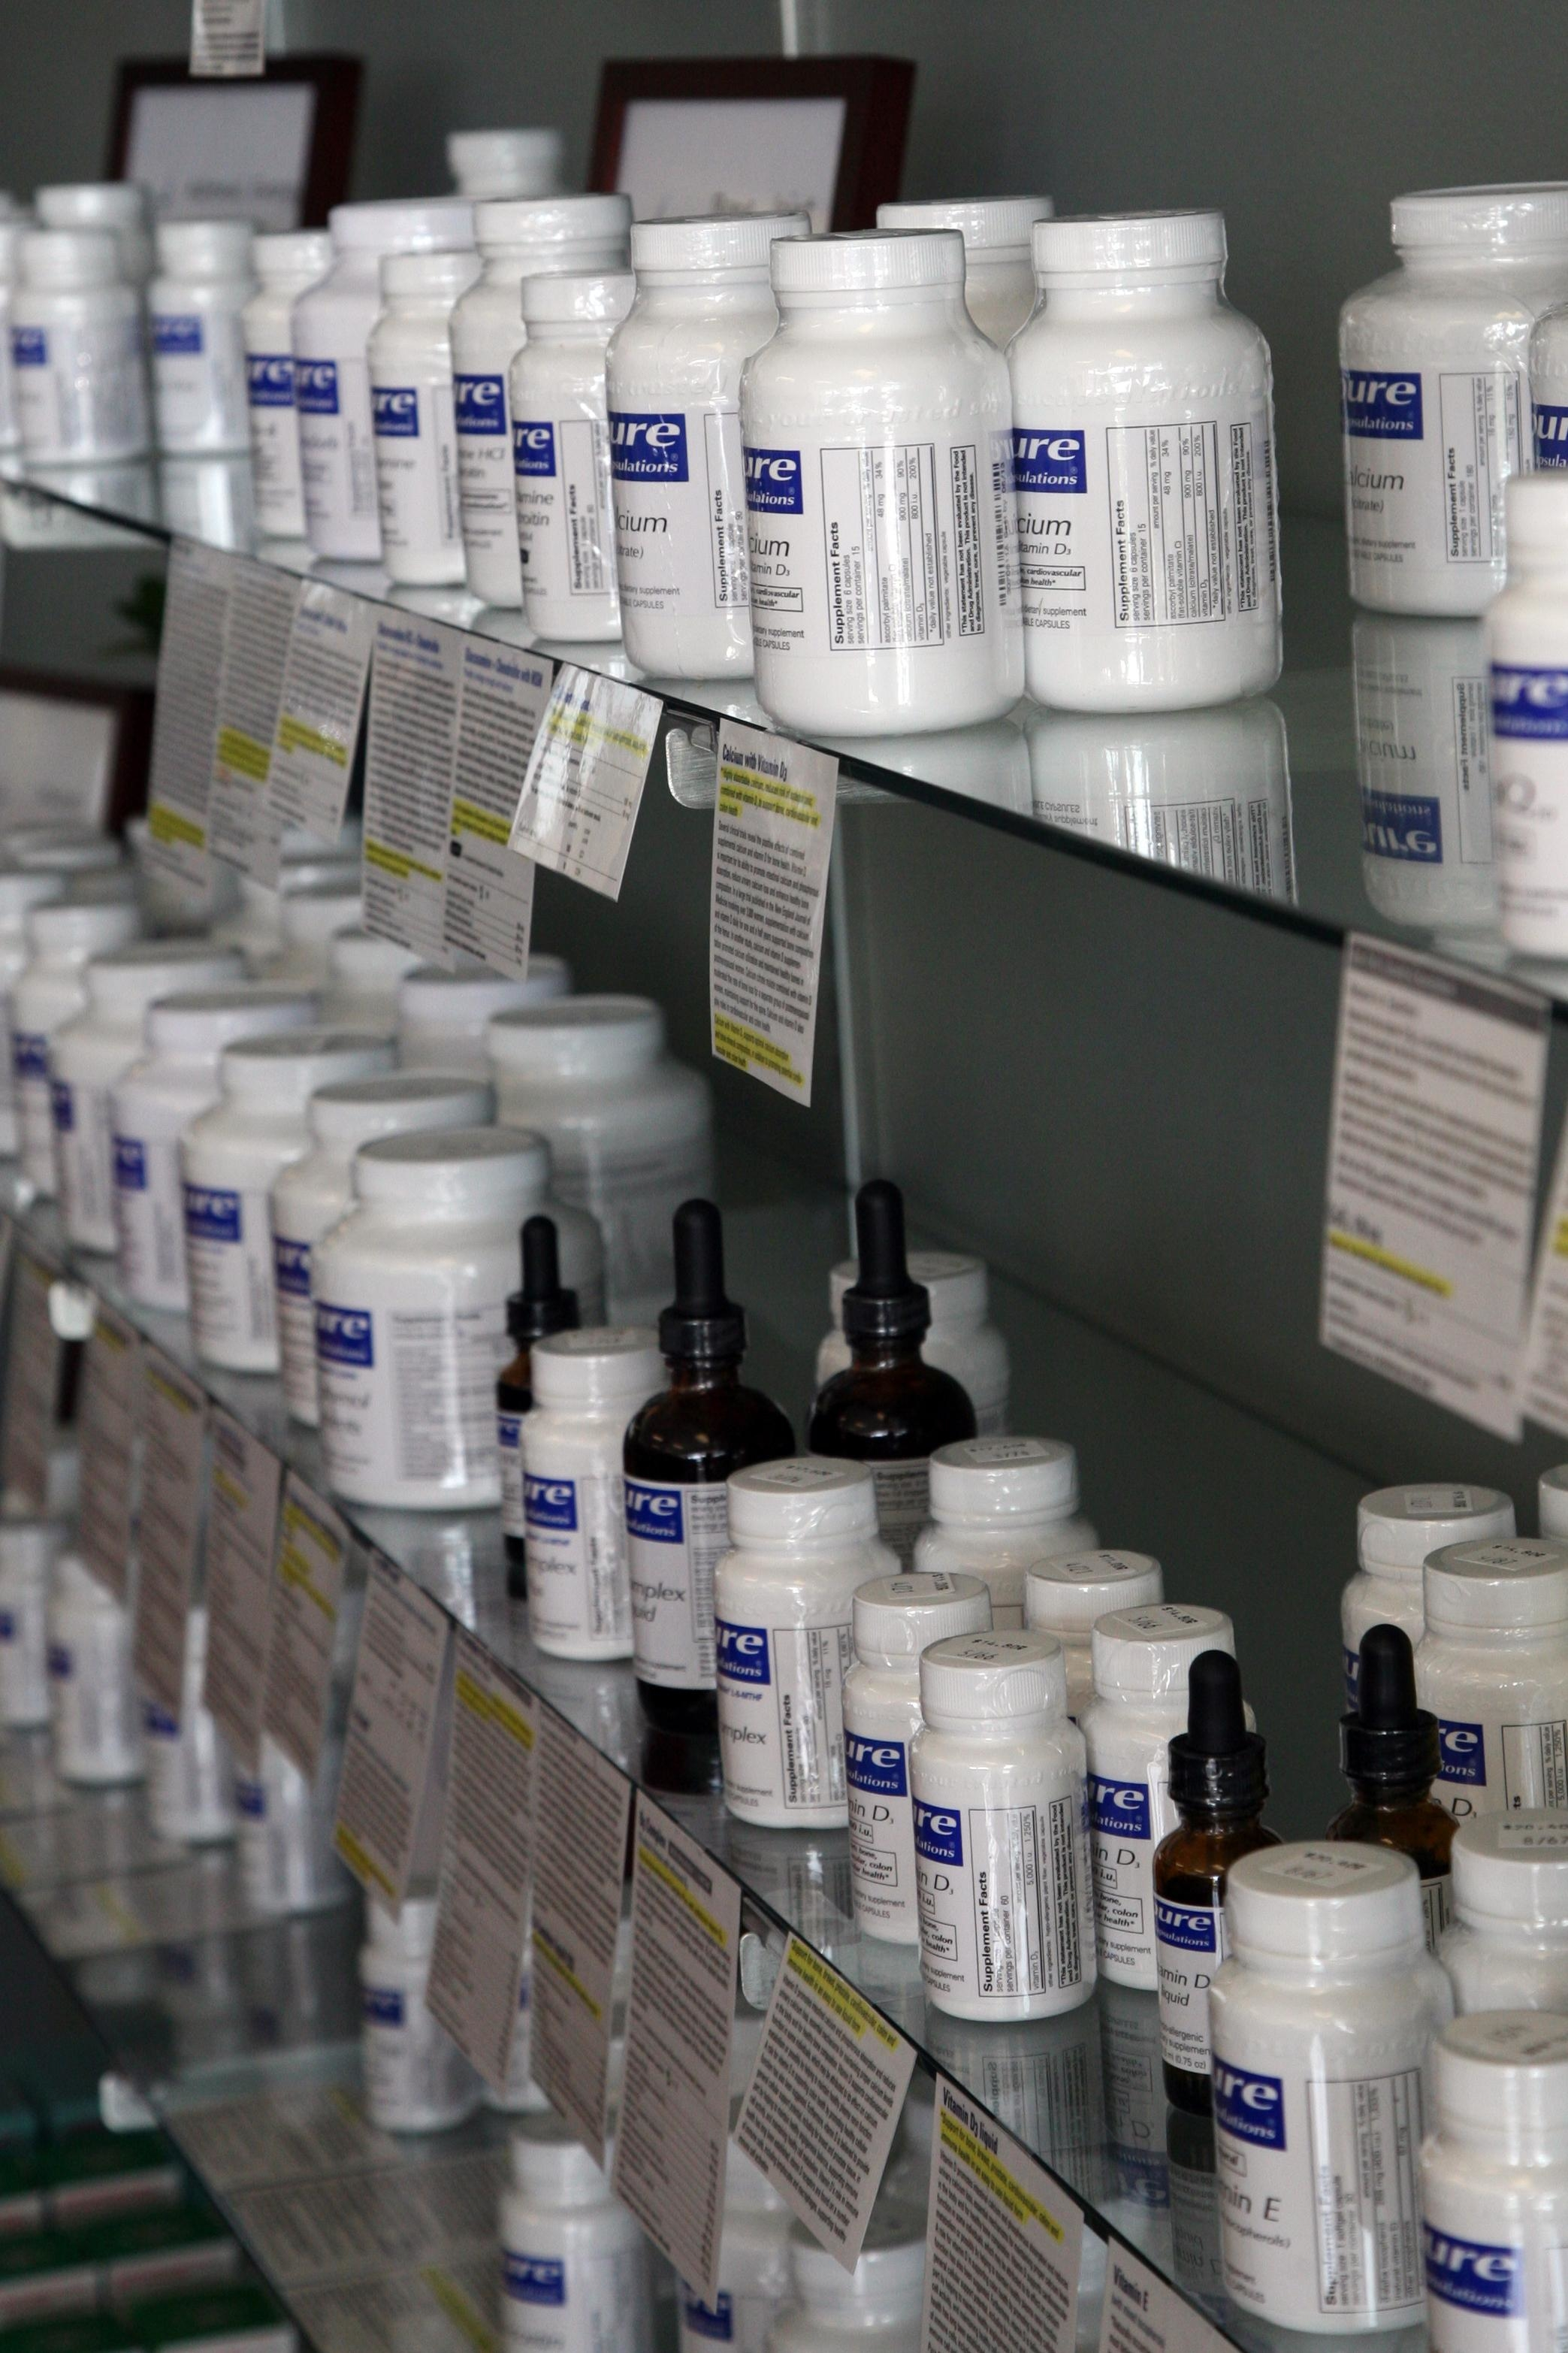 Creative Compounding Pharmacy Inc In Tustin Ca 92780